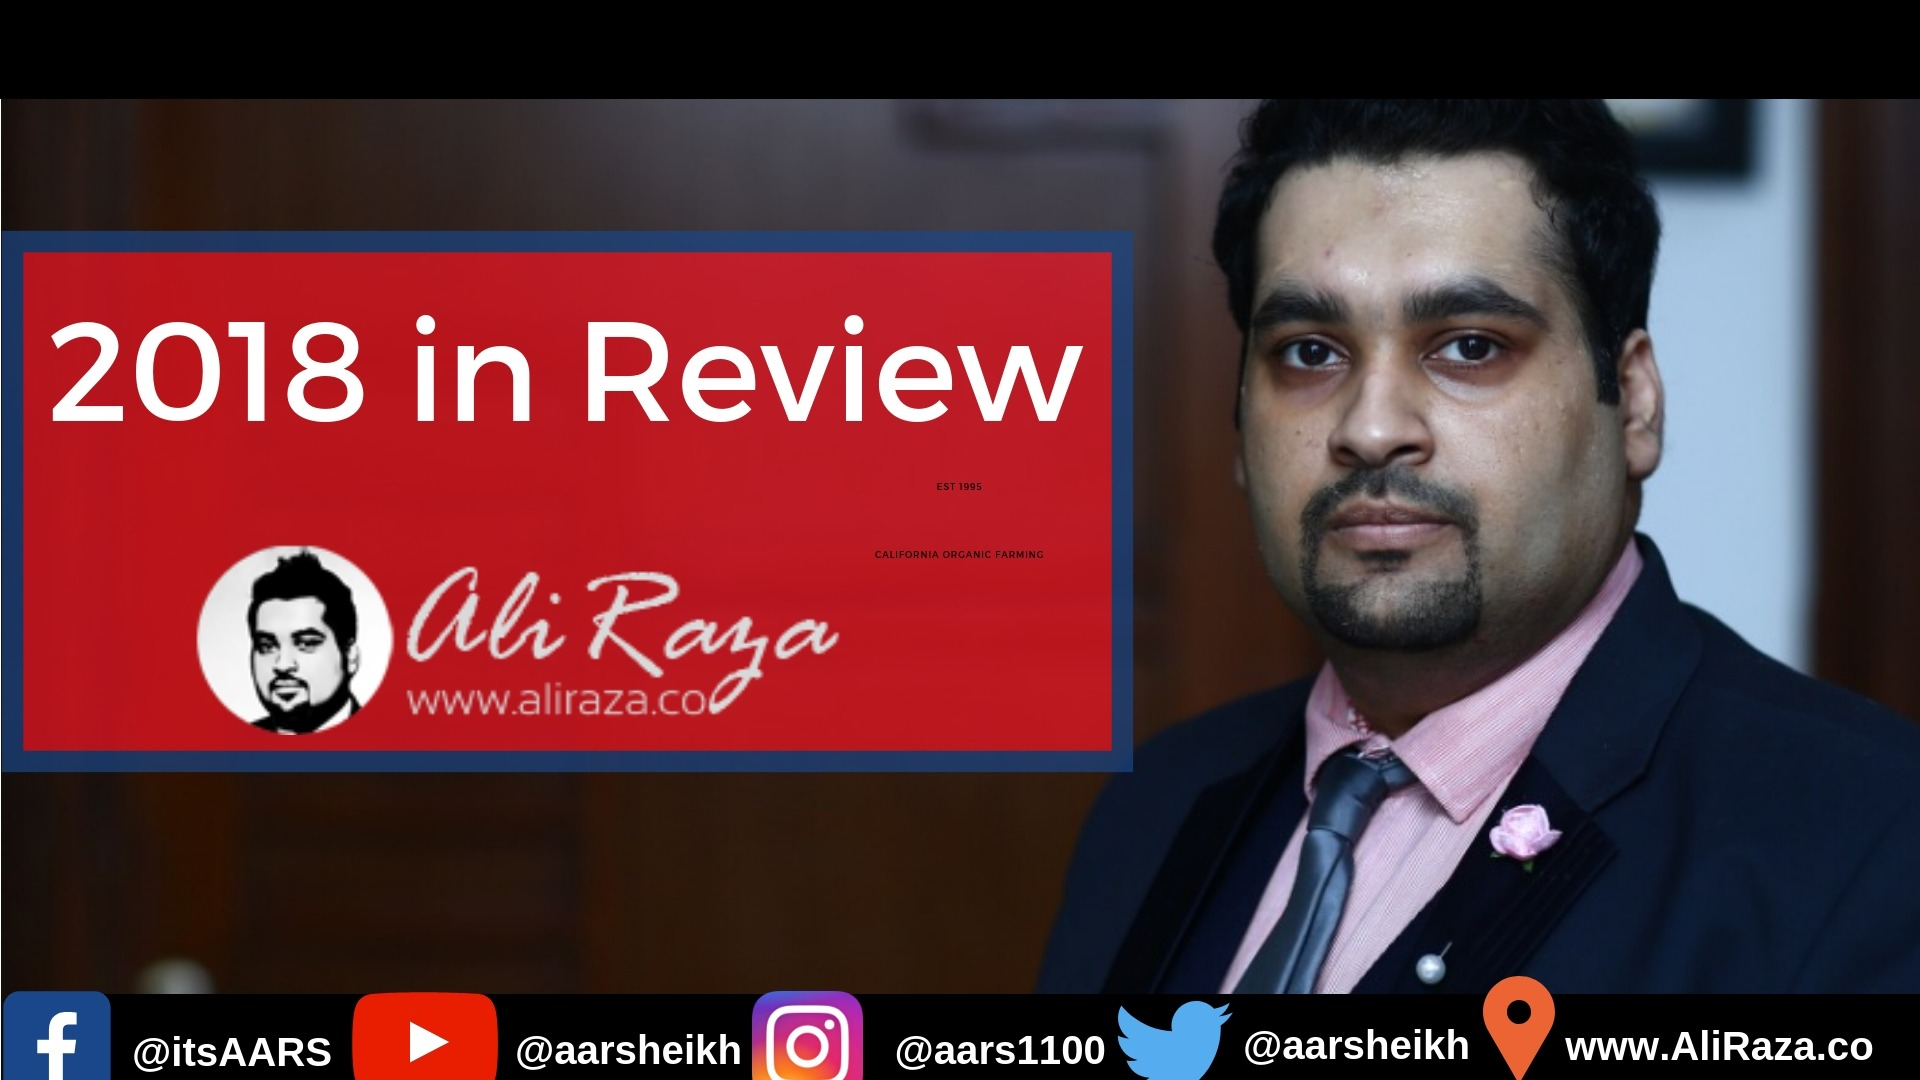 2018 Review aliraza.co